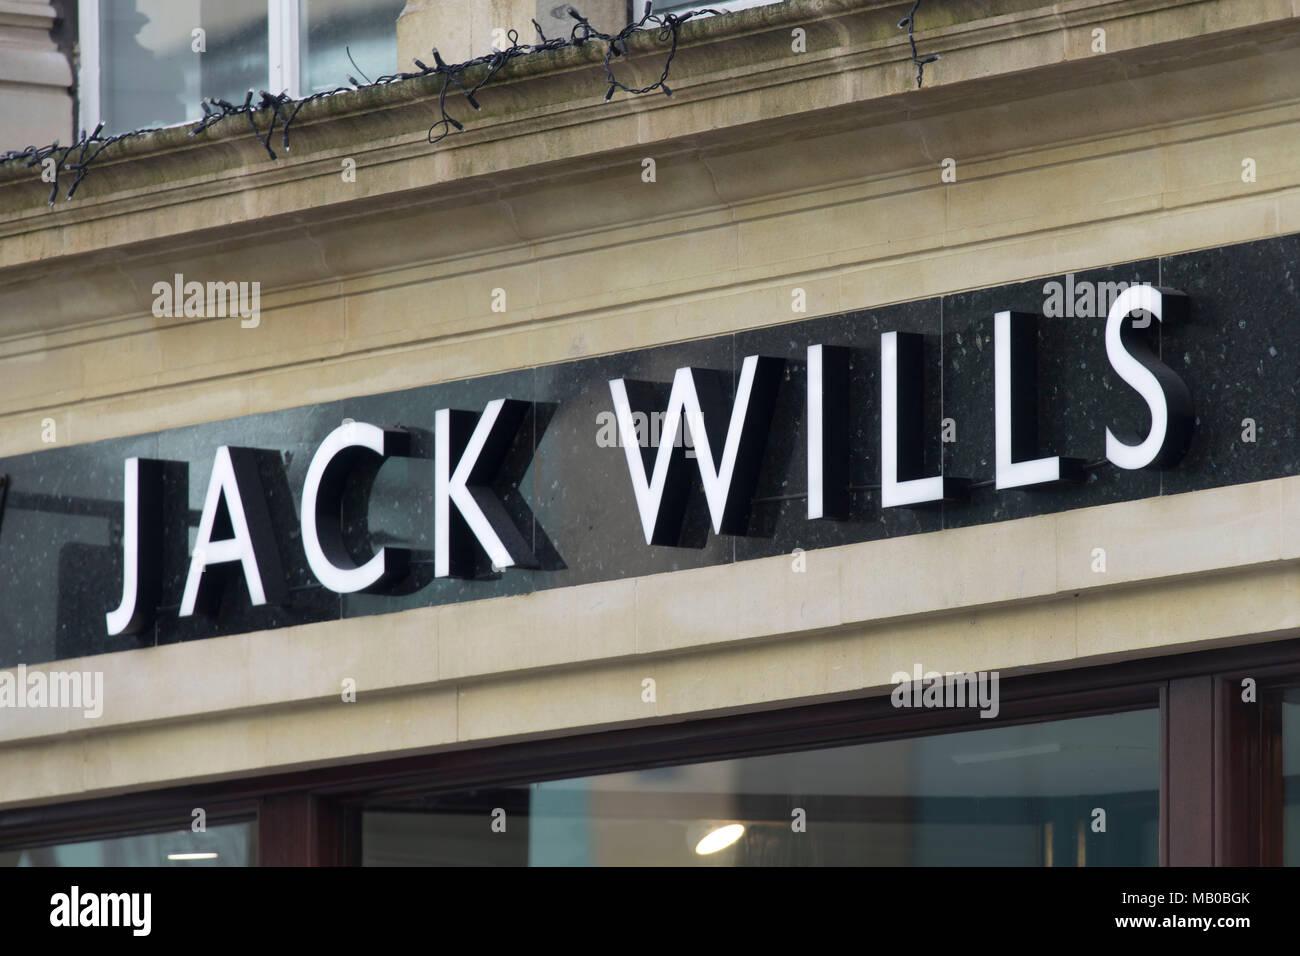 Jack Wills clothing store shop sign logo. - Stock Image